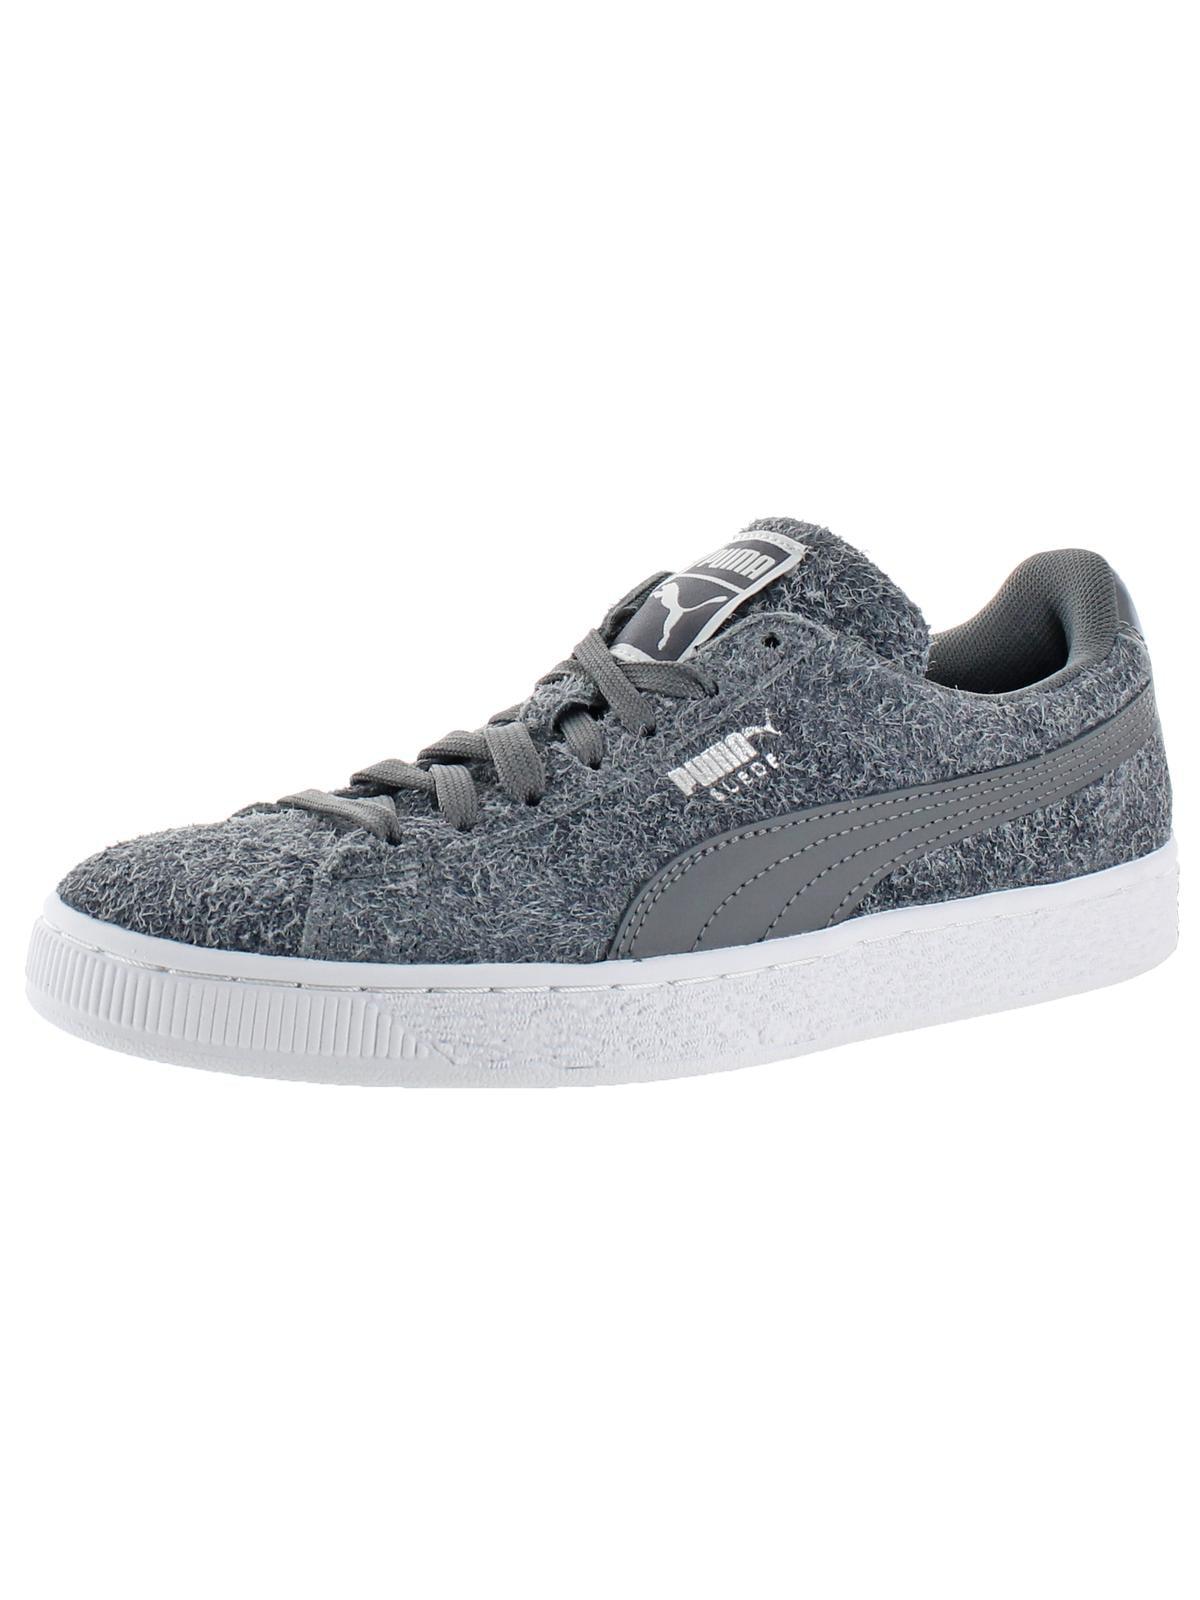 Puma Women's Suede Elemental Puma Black/Puma White Ankle-High Suede Fashion Sneaker - 8.5M